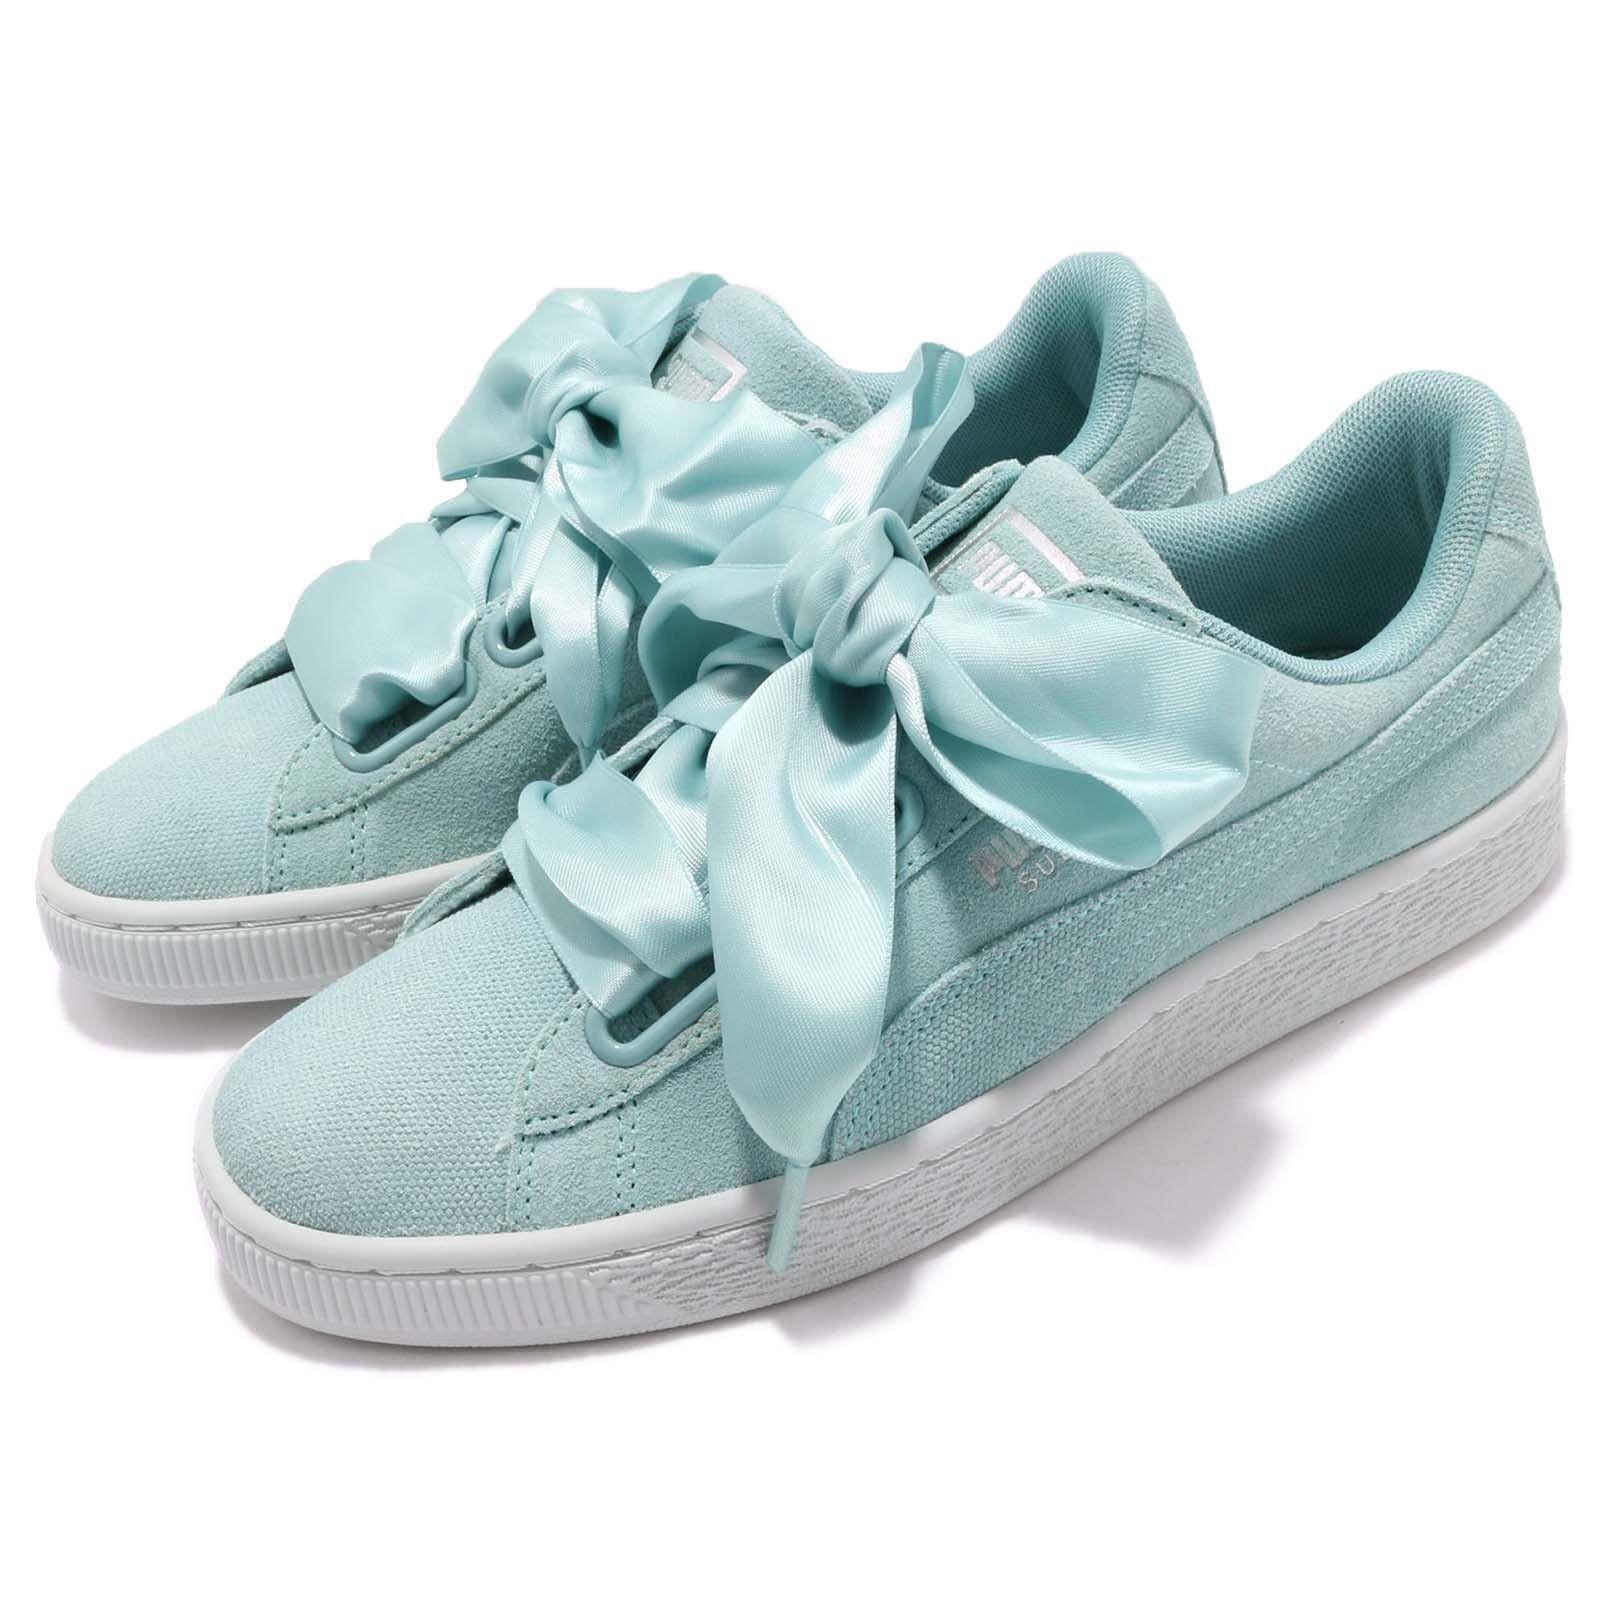 Puma Suede Heart Pebble Wns Bow Aquifer Blue Flower Donna Shoes  36521003